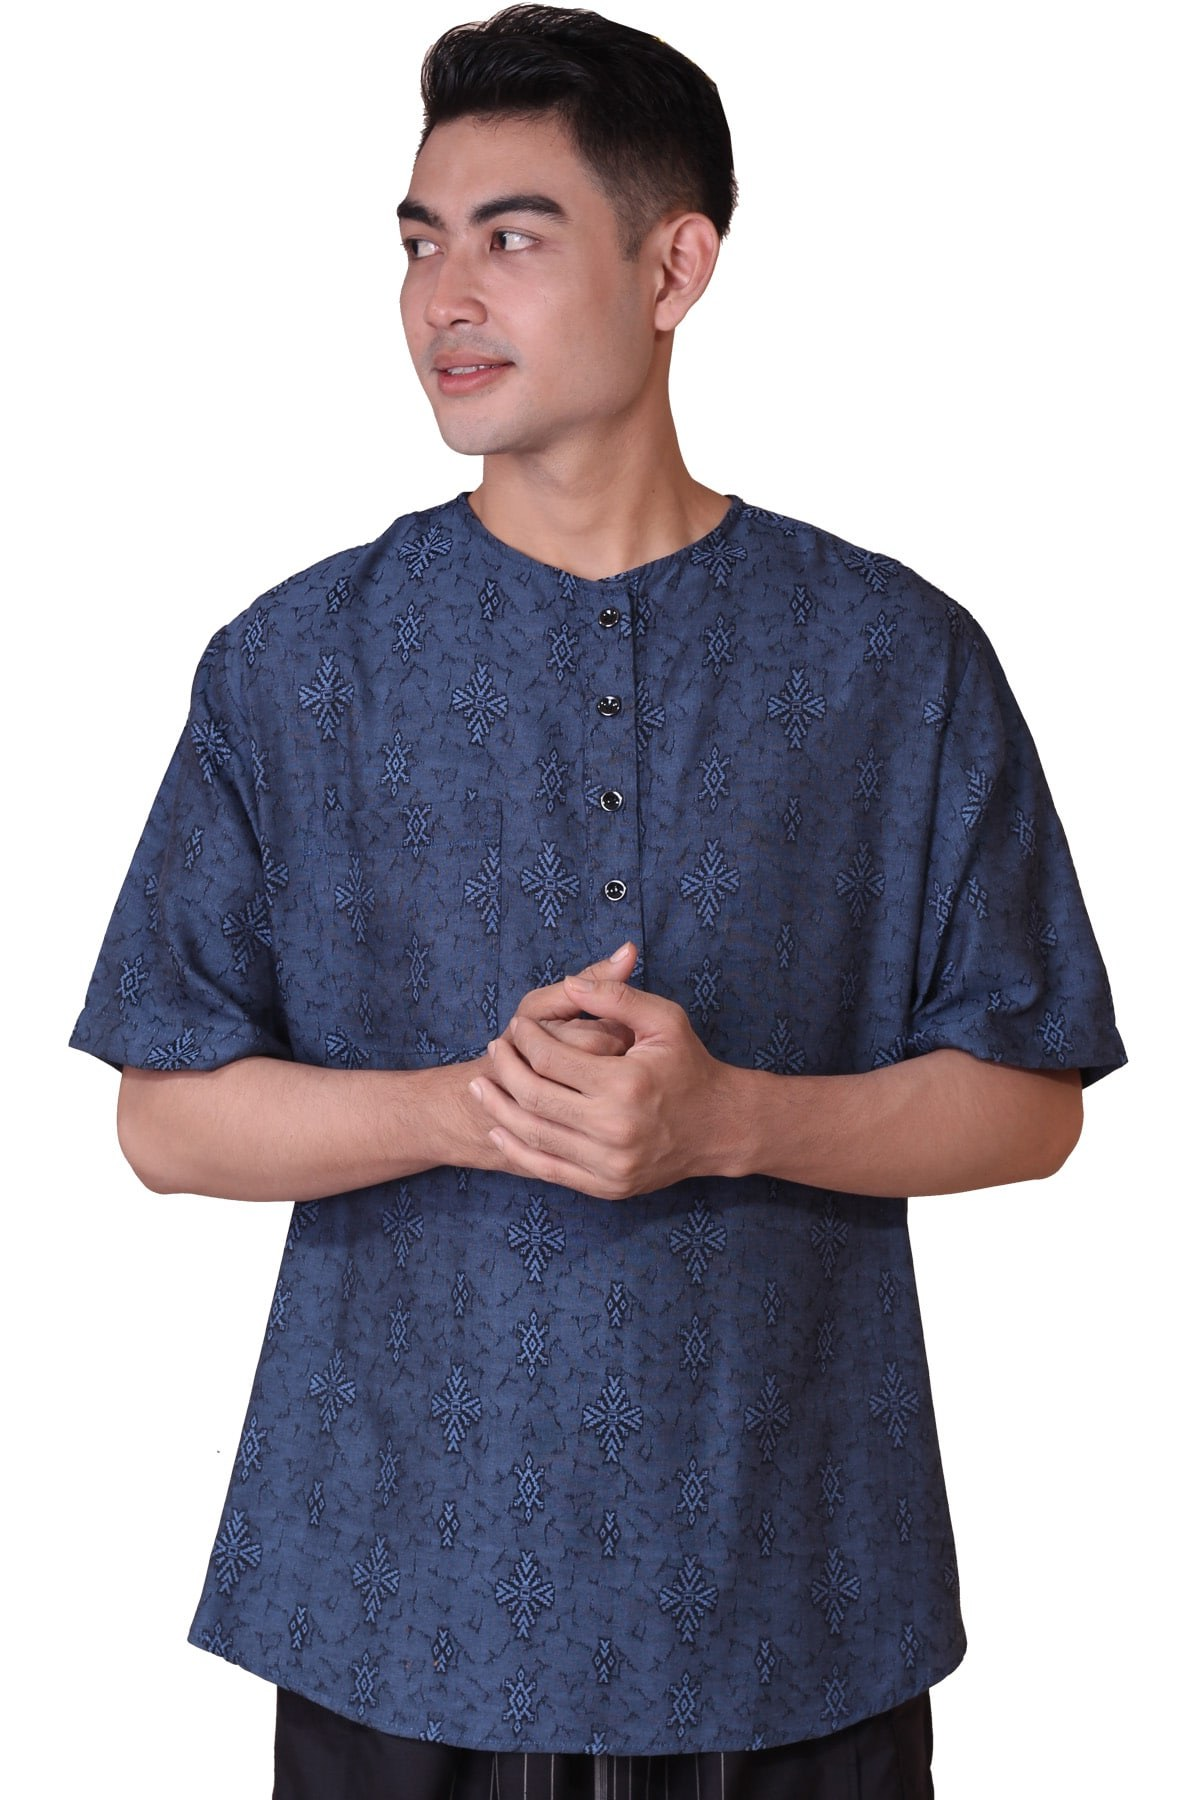 Ide Sewa Baju Pengantin Muslim Modern 4pde Busana Muslim Jogja Baju Busana Muslim Pria Wanita